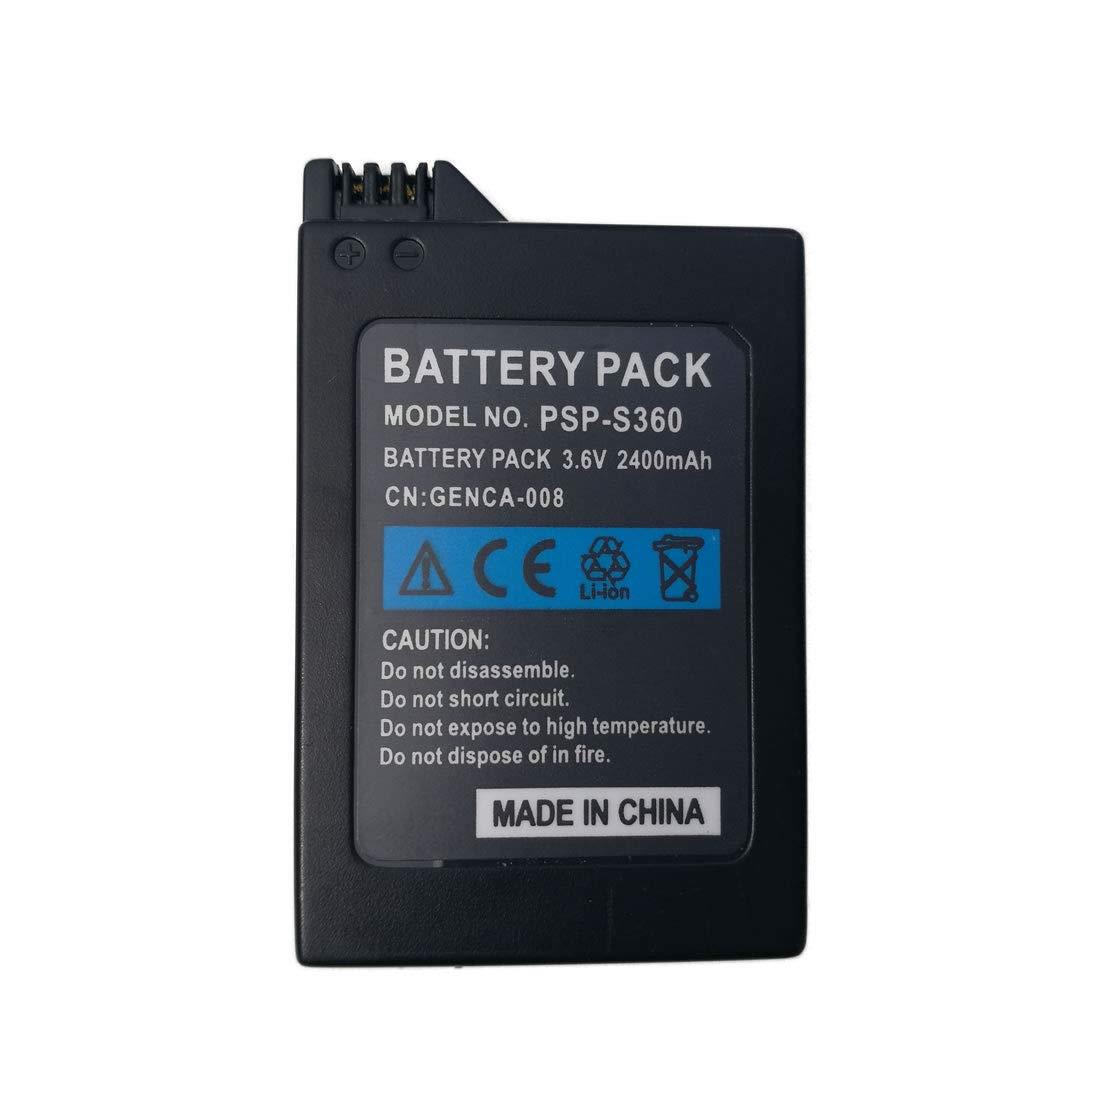 Amazon.com: FidgetKute 2PK - Batería recargable para Sony ...